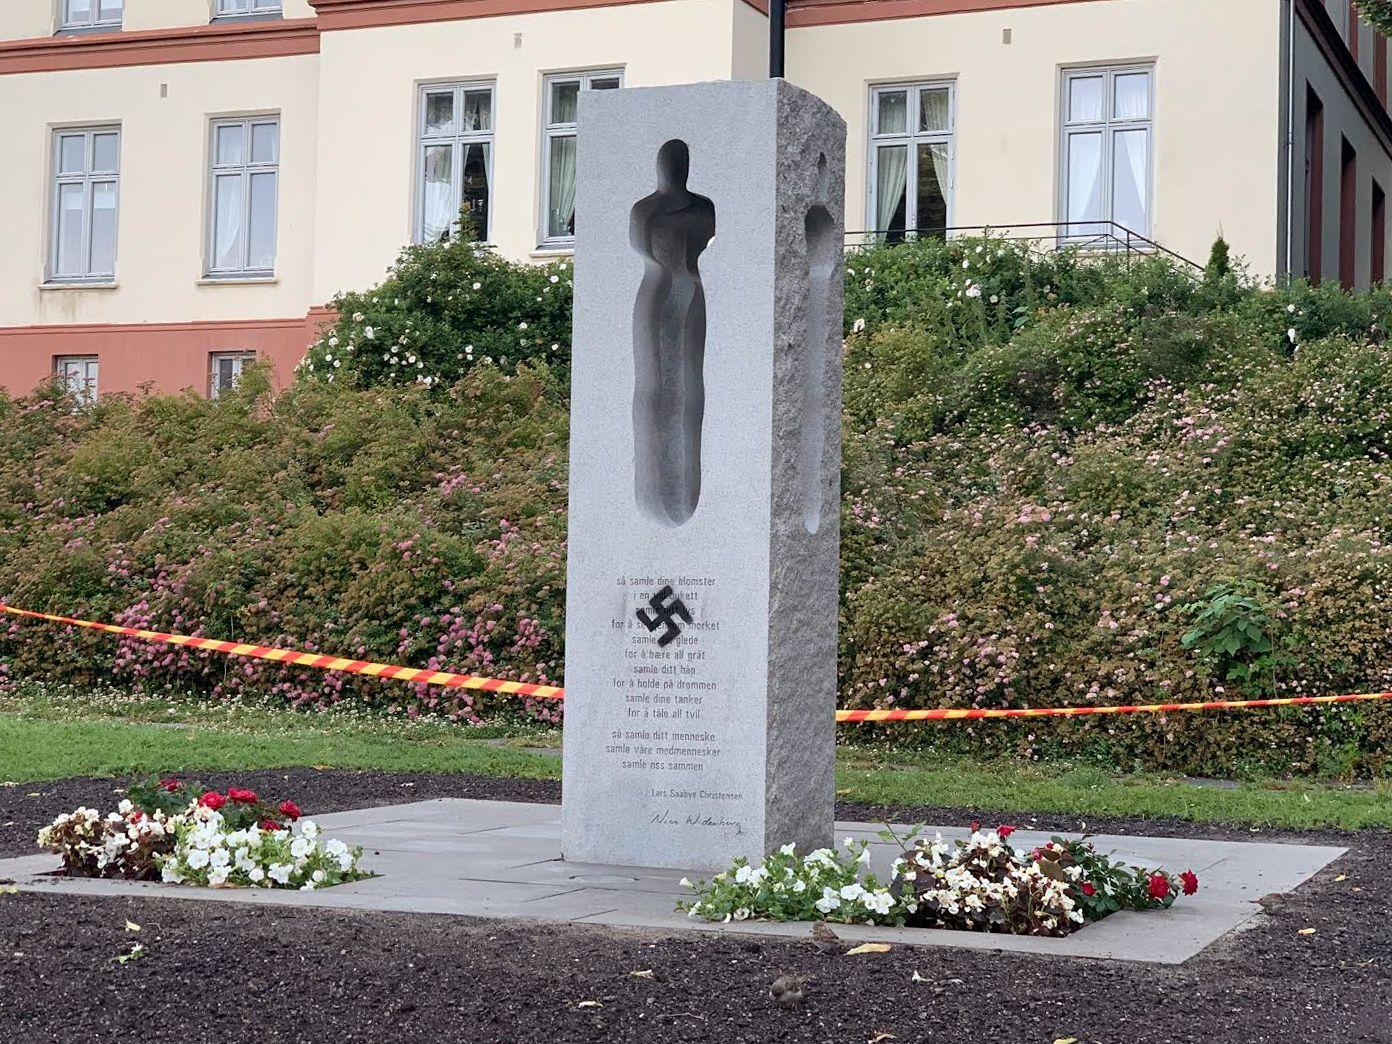 HAKEKORS: Mandag morgen var det tagget et hakekors på 22. juli-minnesmerket i Tønsberg.